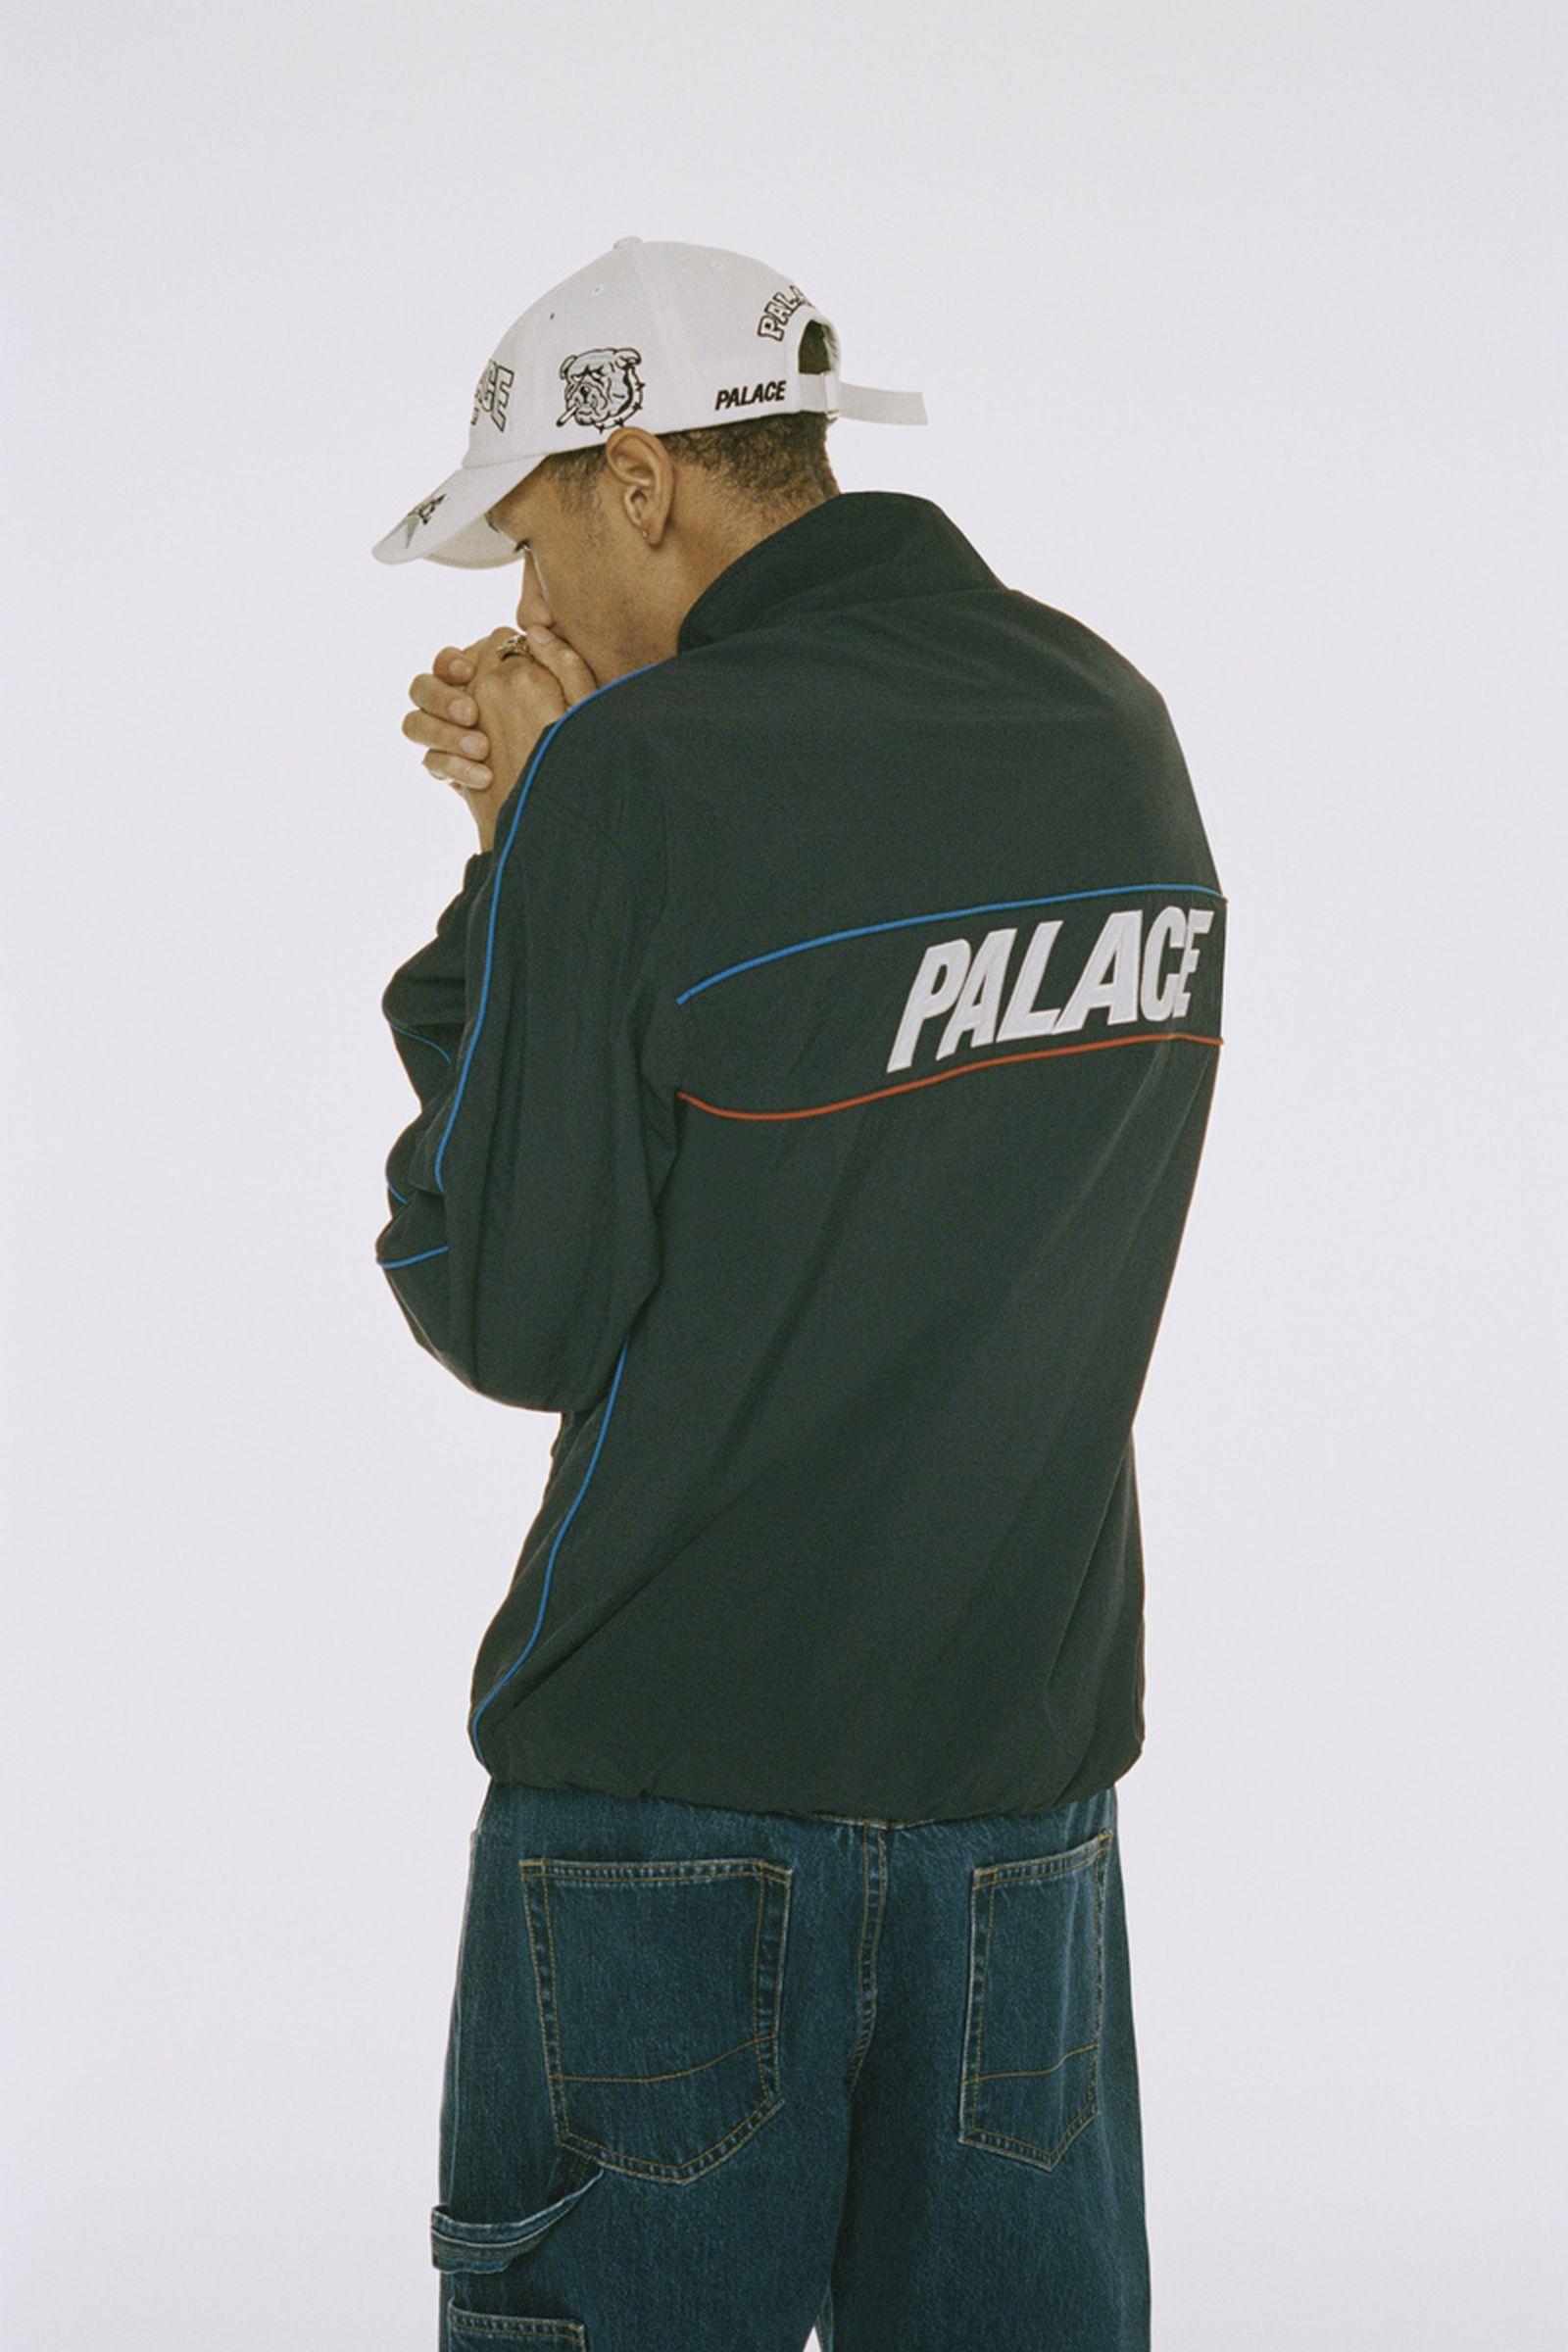 LS_PALACE_R51F25 001